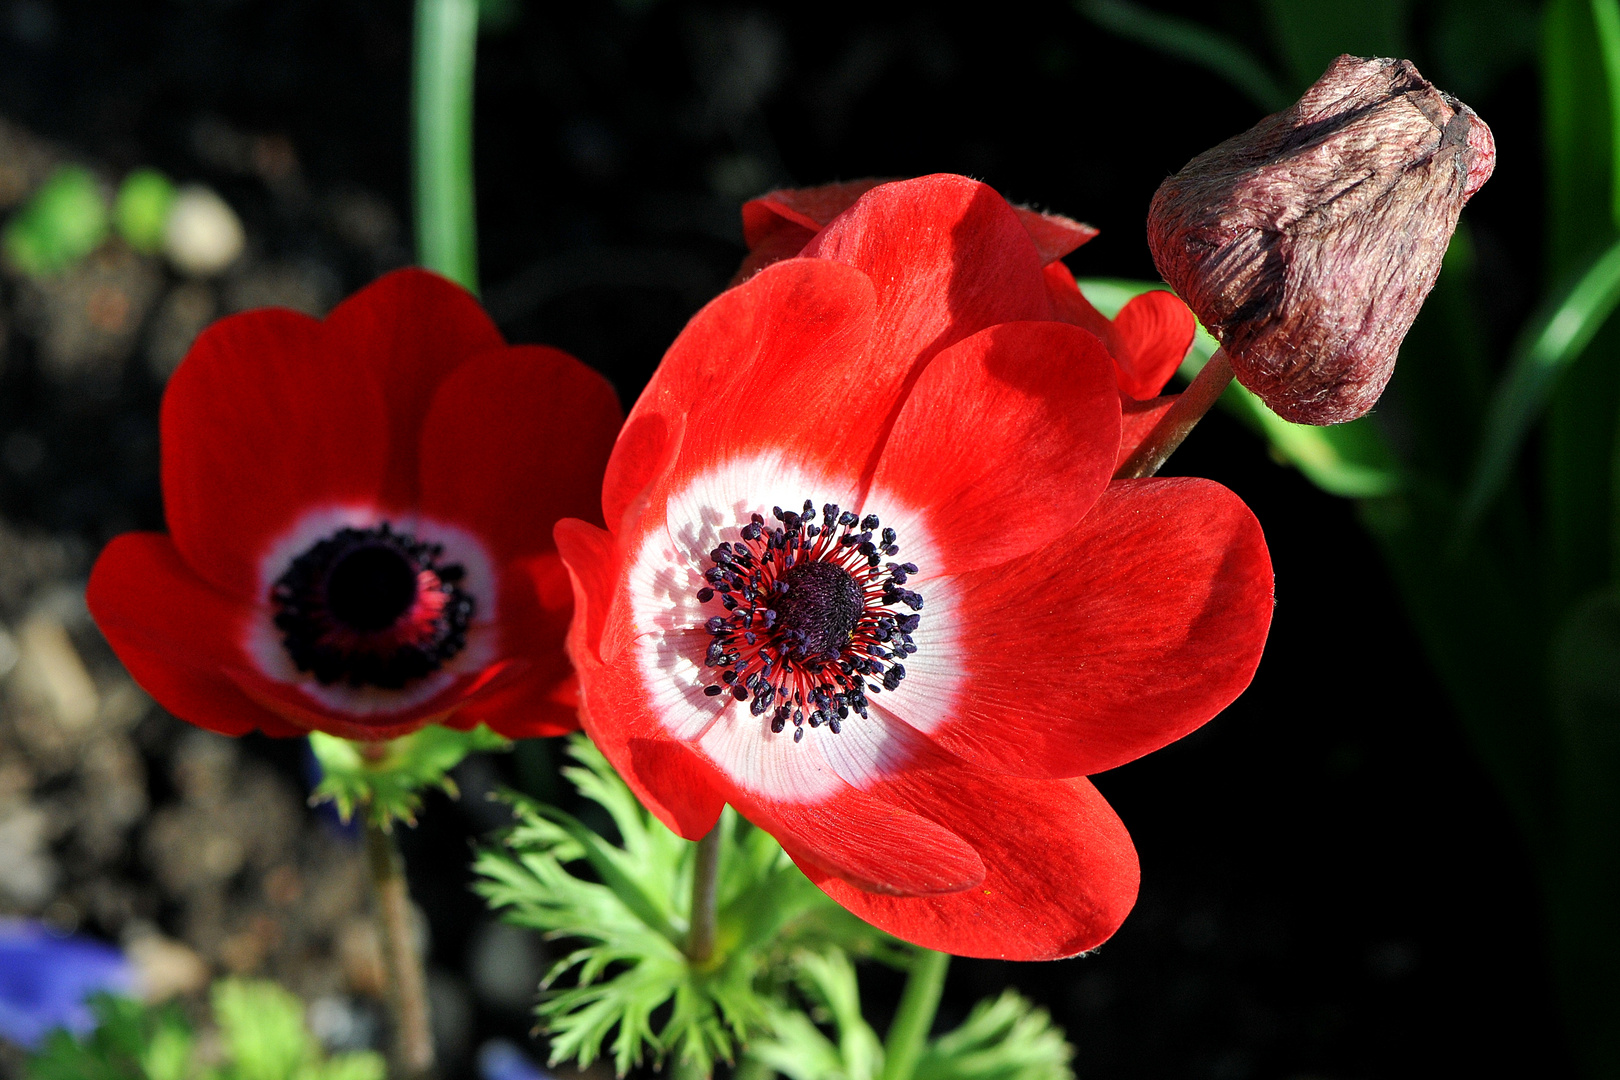 rotblühende Kronen Anemone (Anemone coronaria)